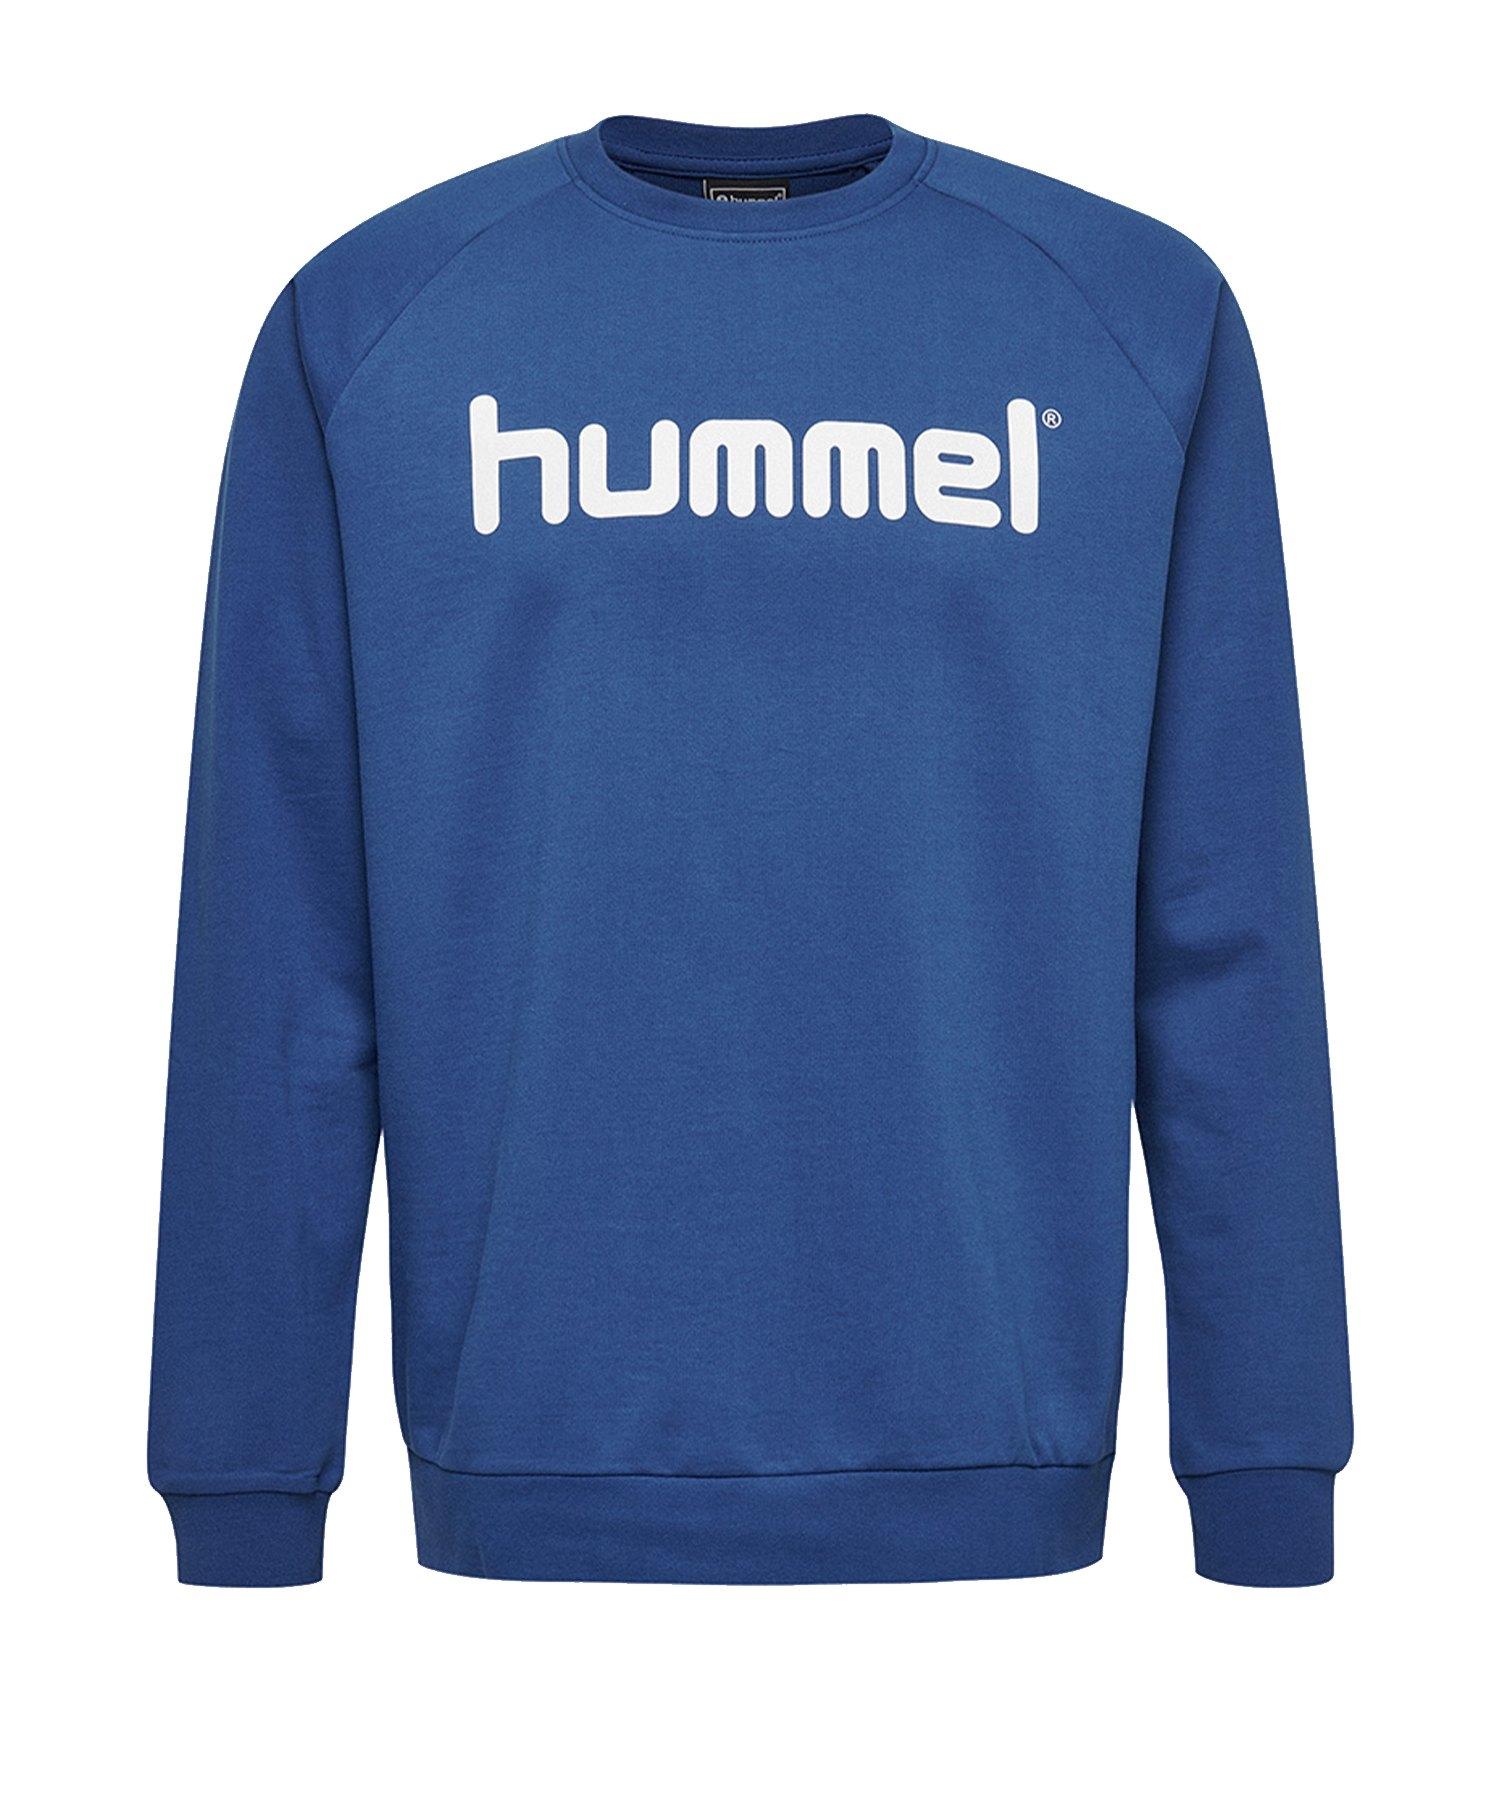 Hummel Cotton Logo Sweatshirt Kids Blau F7045 - Blau